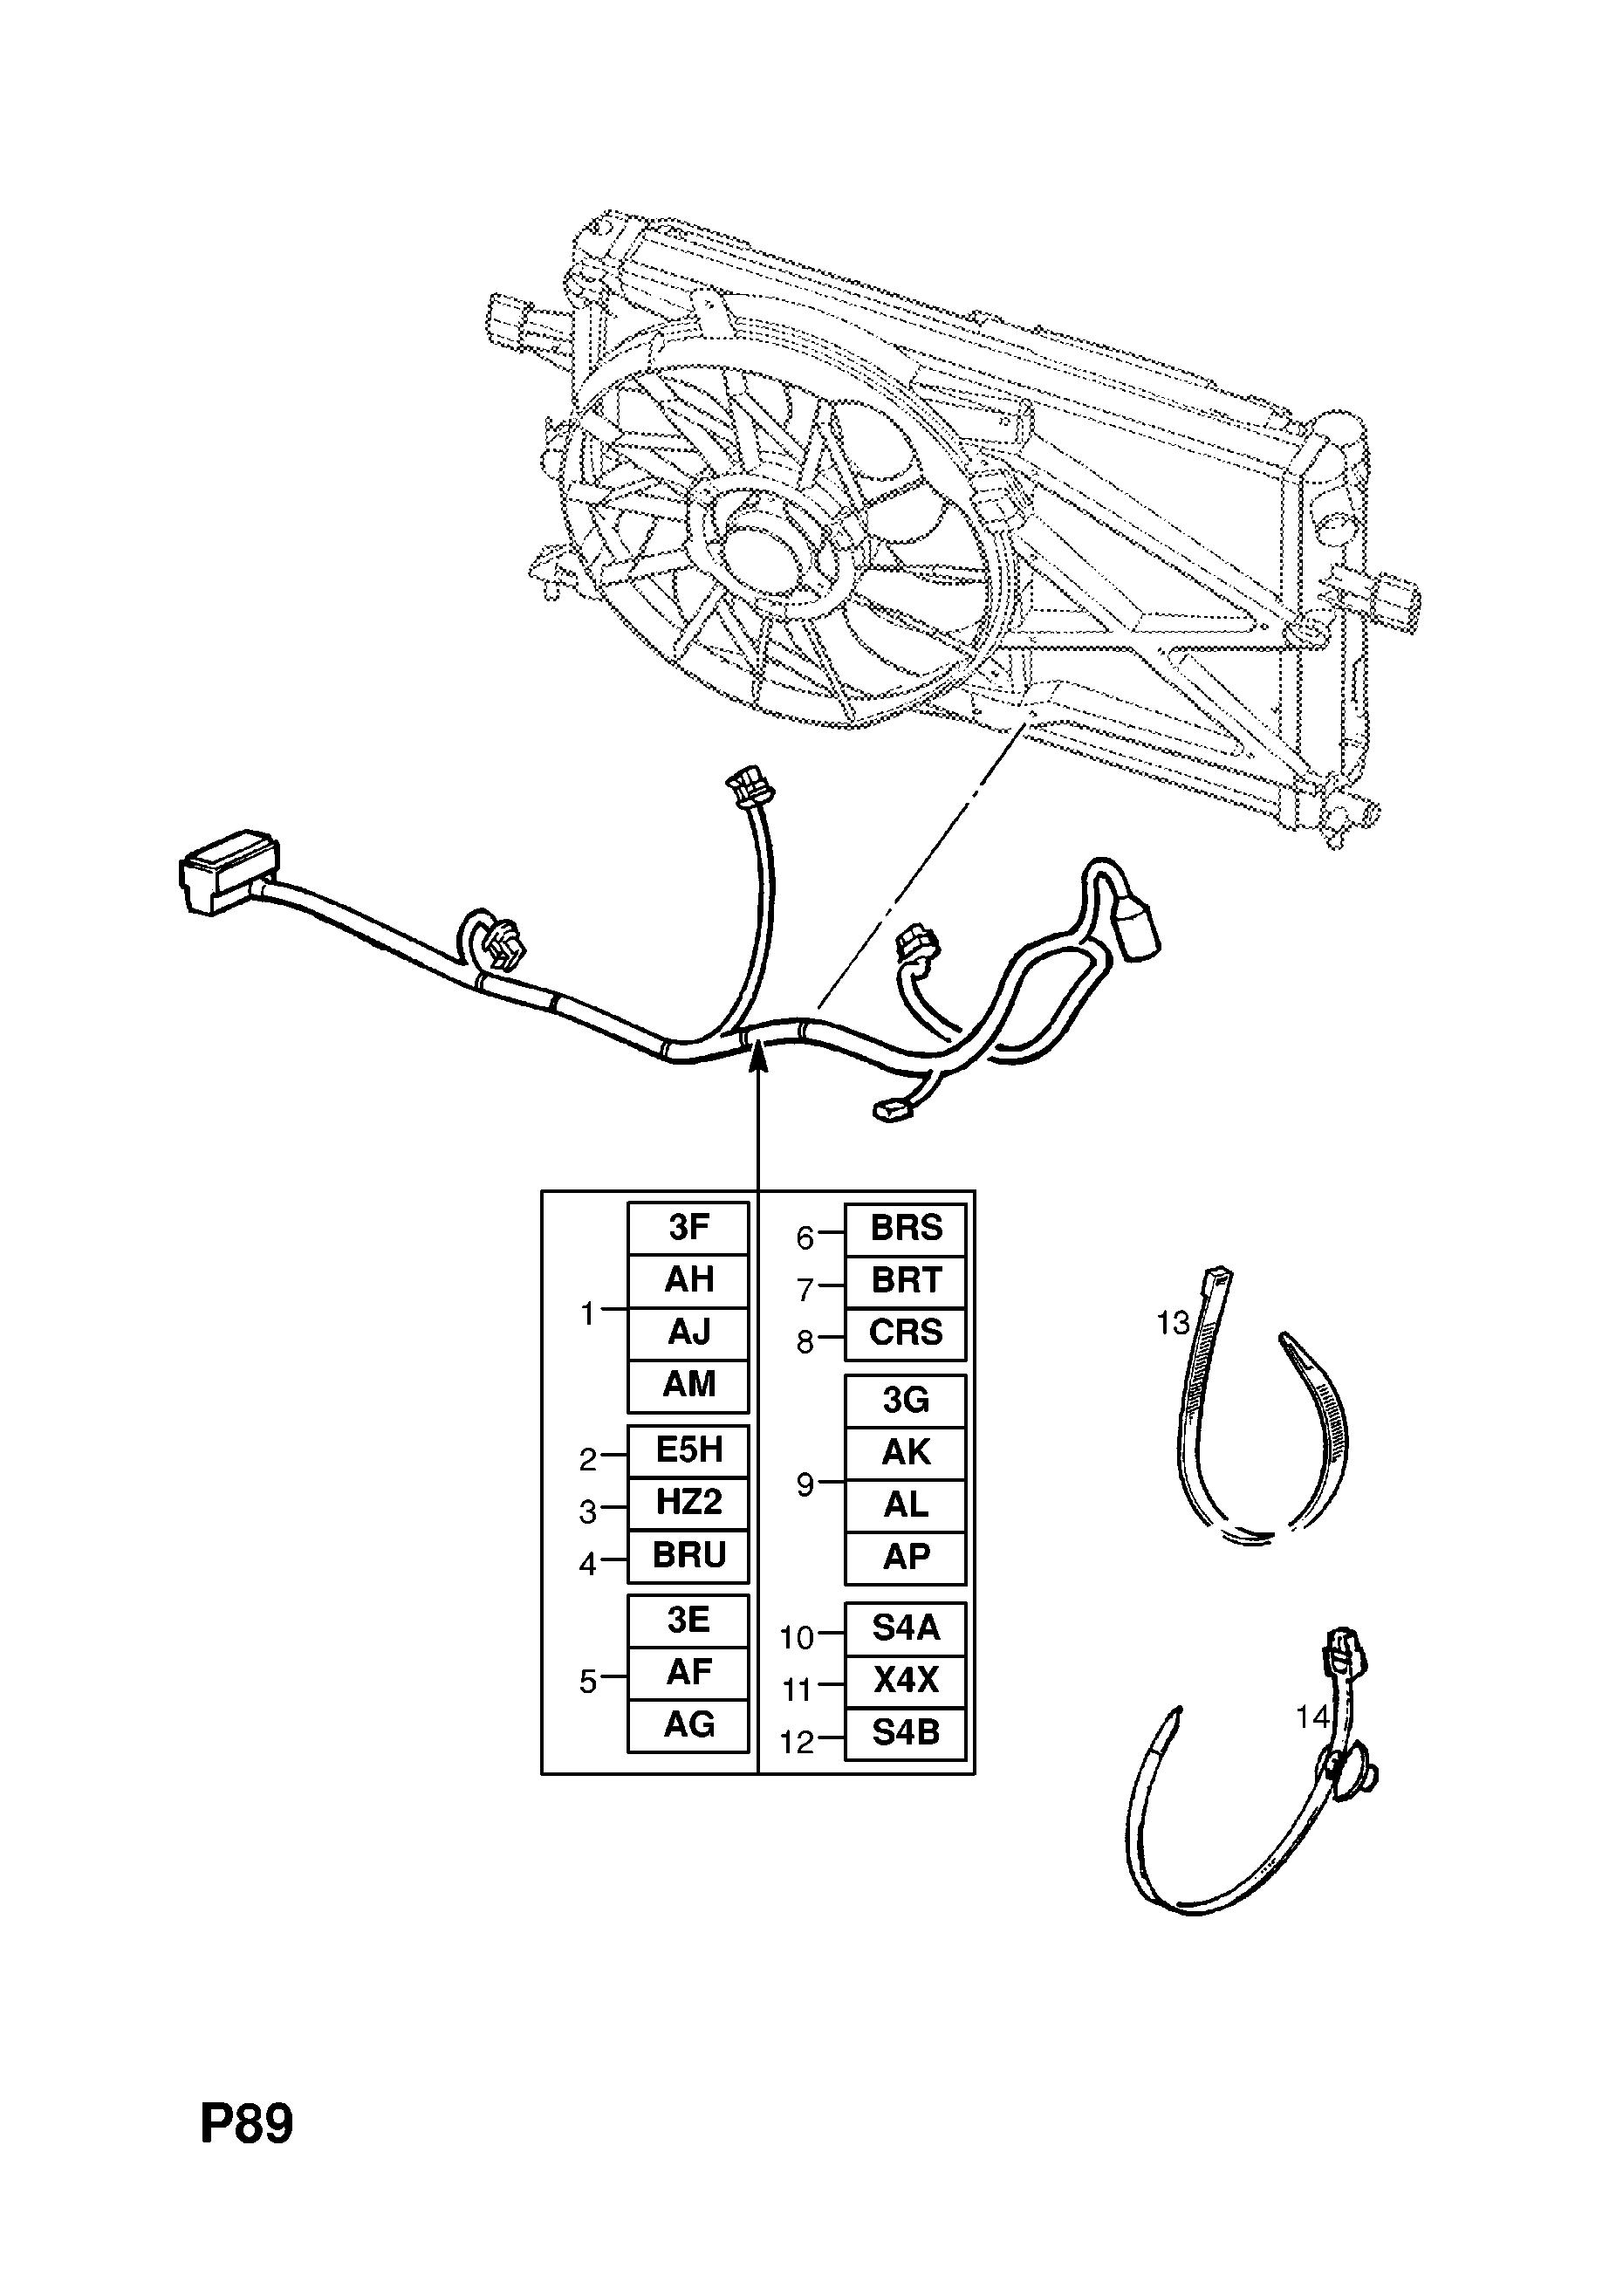 Astra G Alternator Wiring Diagram 1993 Subaru Legacy Engine Diagram Deviille Yenpancane Jeanjaures37 Fr